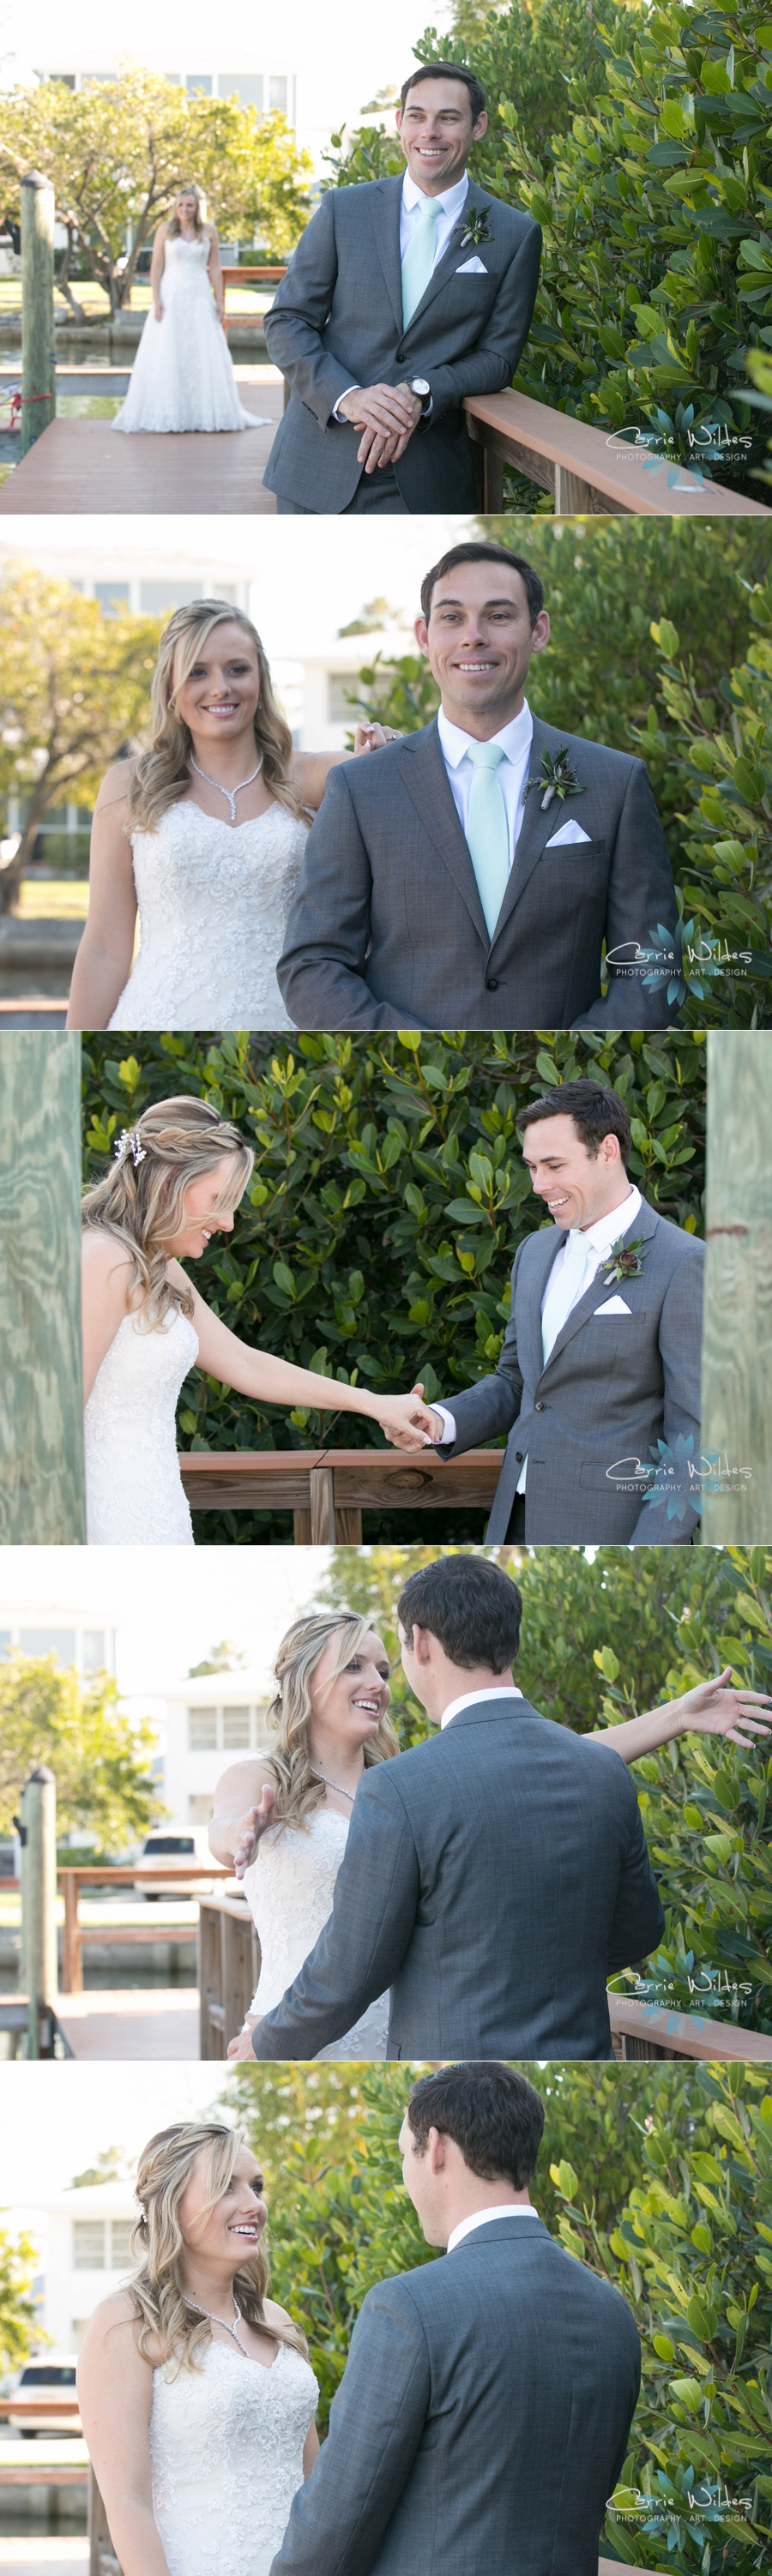 3_24_18 Kristin and Daniel Hotel Zamora Wedding_0023.jpg